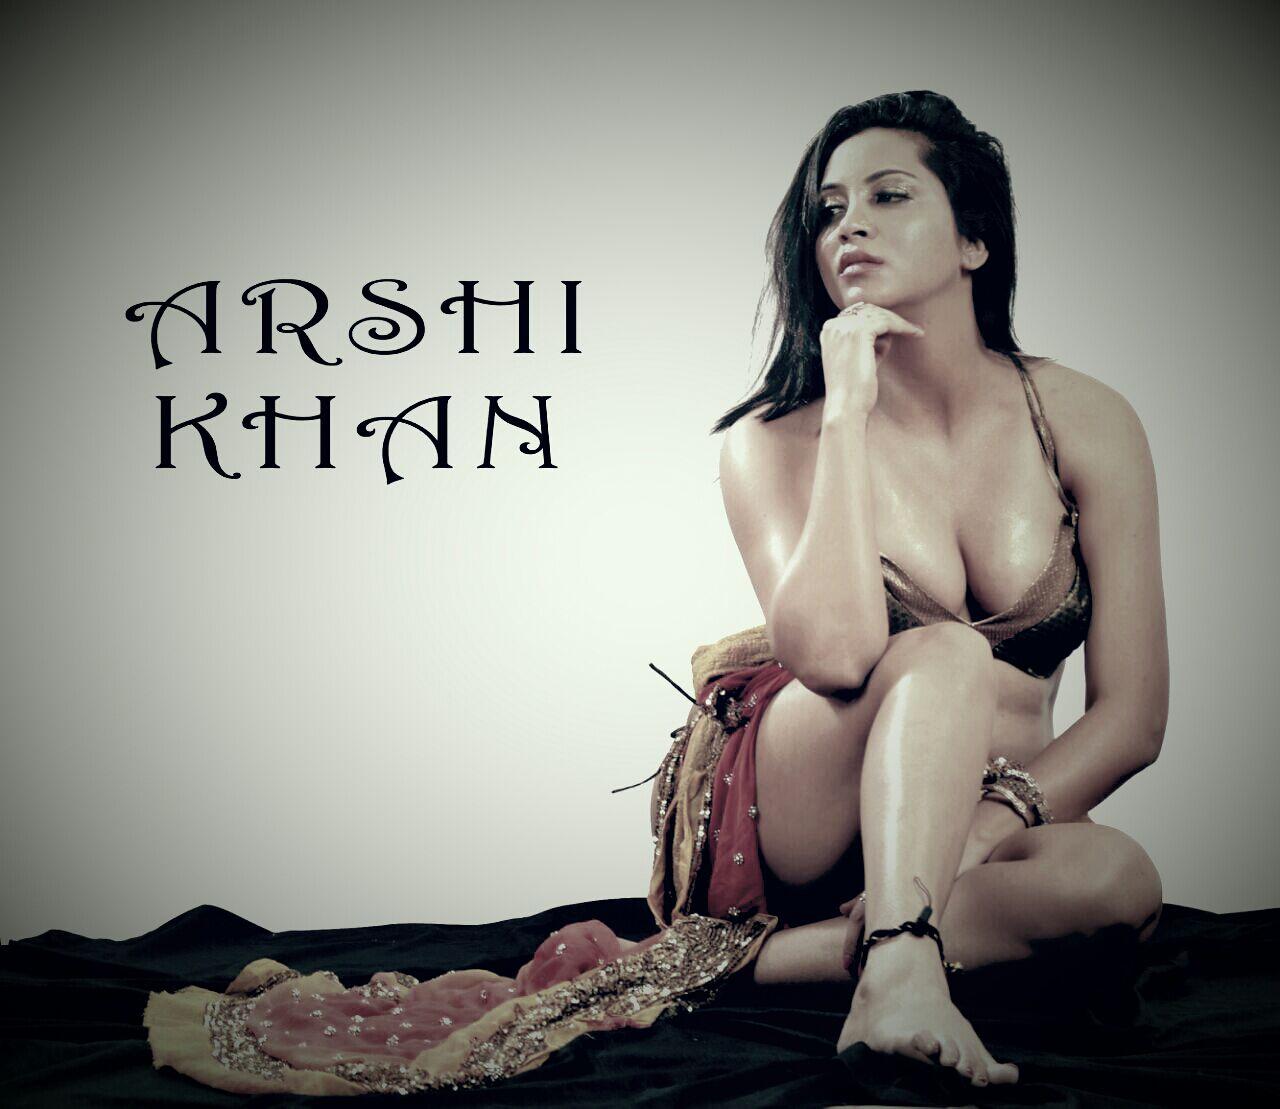 Arshi Khan hot bikini photoshoot